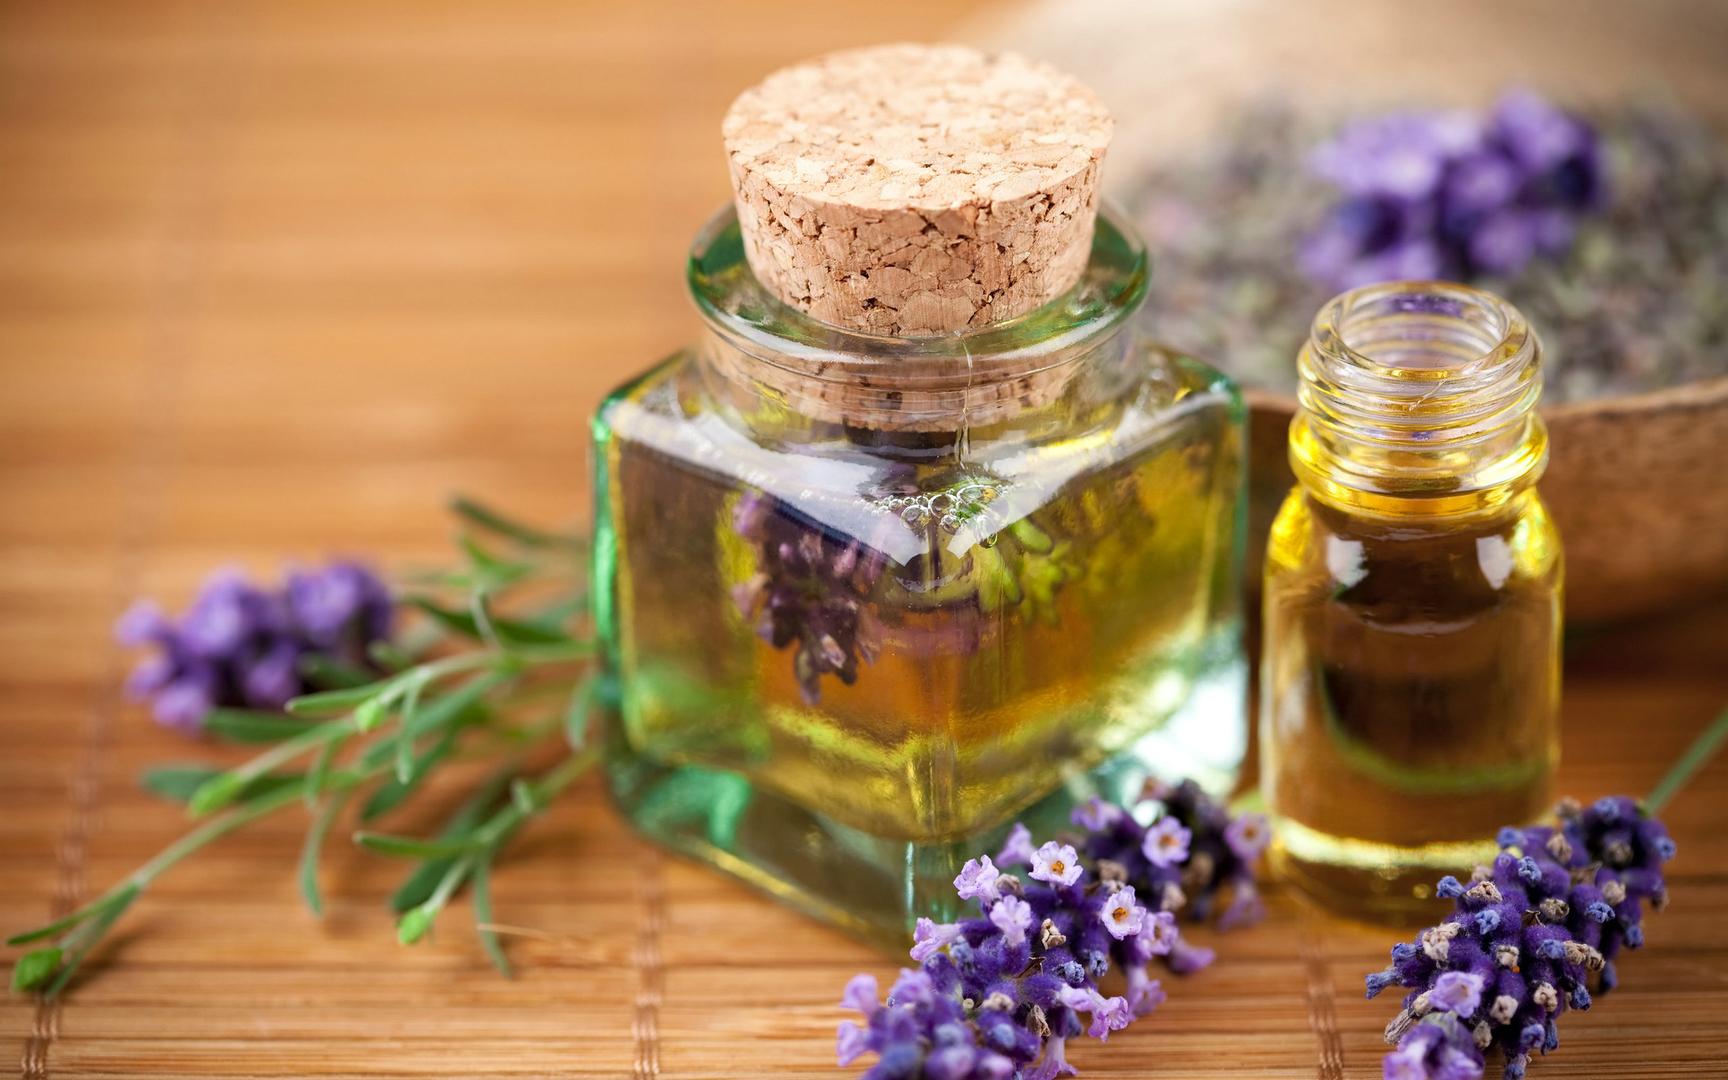 5 Manfaat Minyak Lavender Untuk Kulit Anda   MaryJardin.co